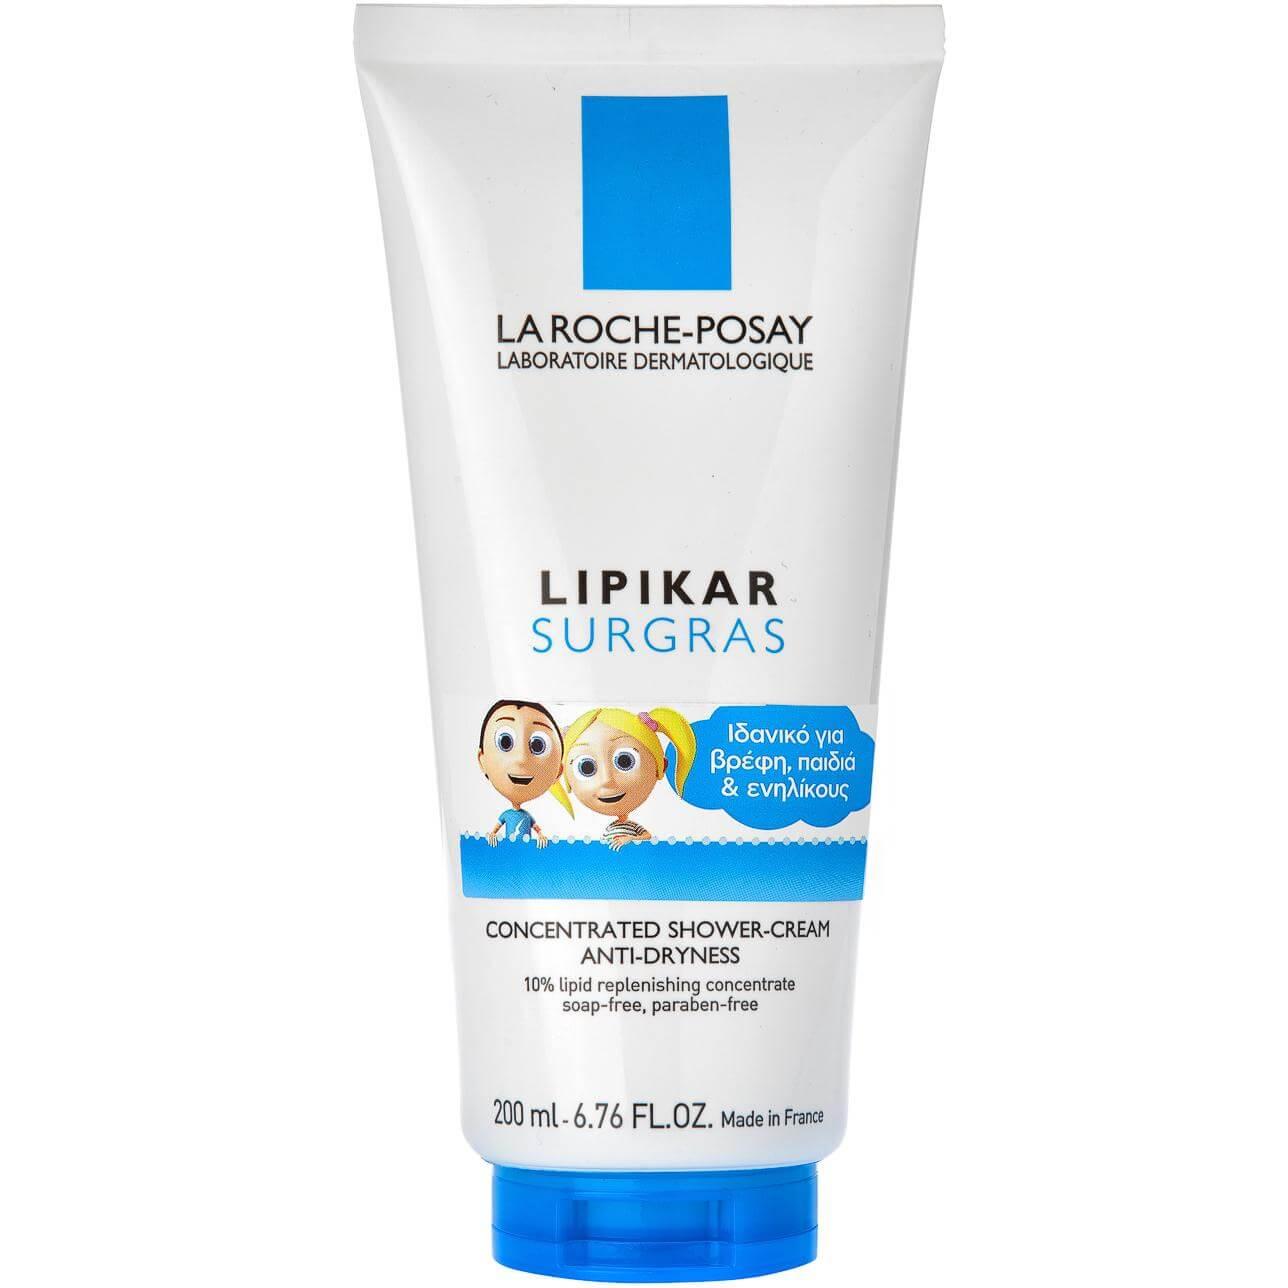 La Roche-Posay Lipikar Surgras Liquid Συμπυκνωμένη Κρέμα για Ντους που Αναπληρώνει τα Λιπίδια του Δέρματος 200ml